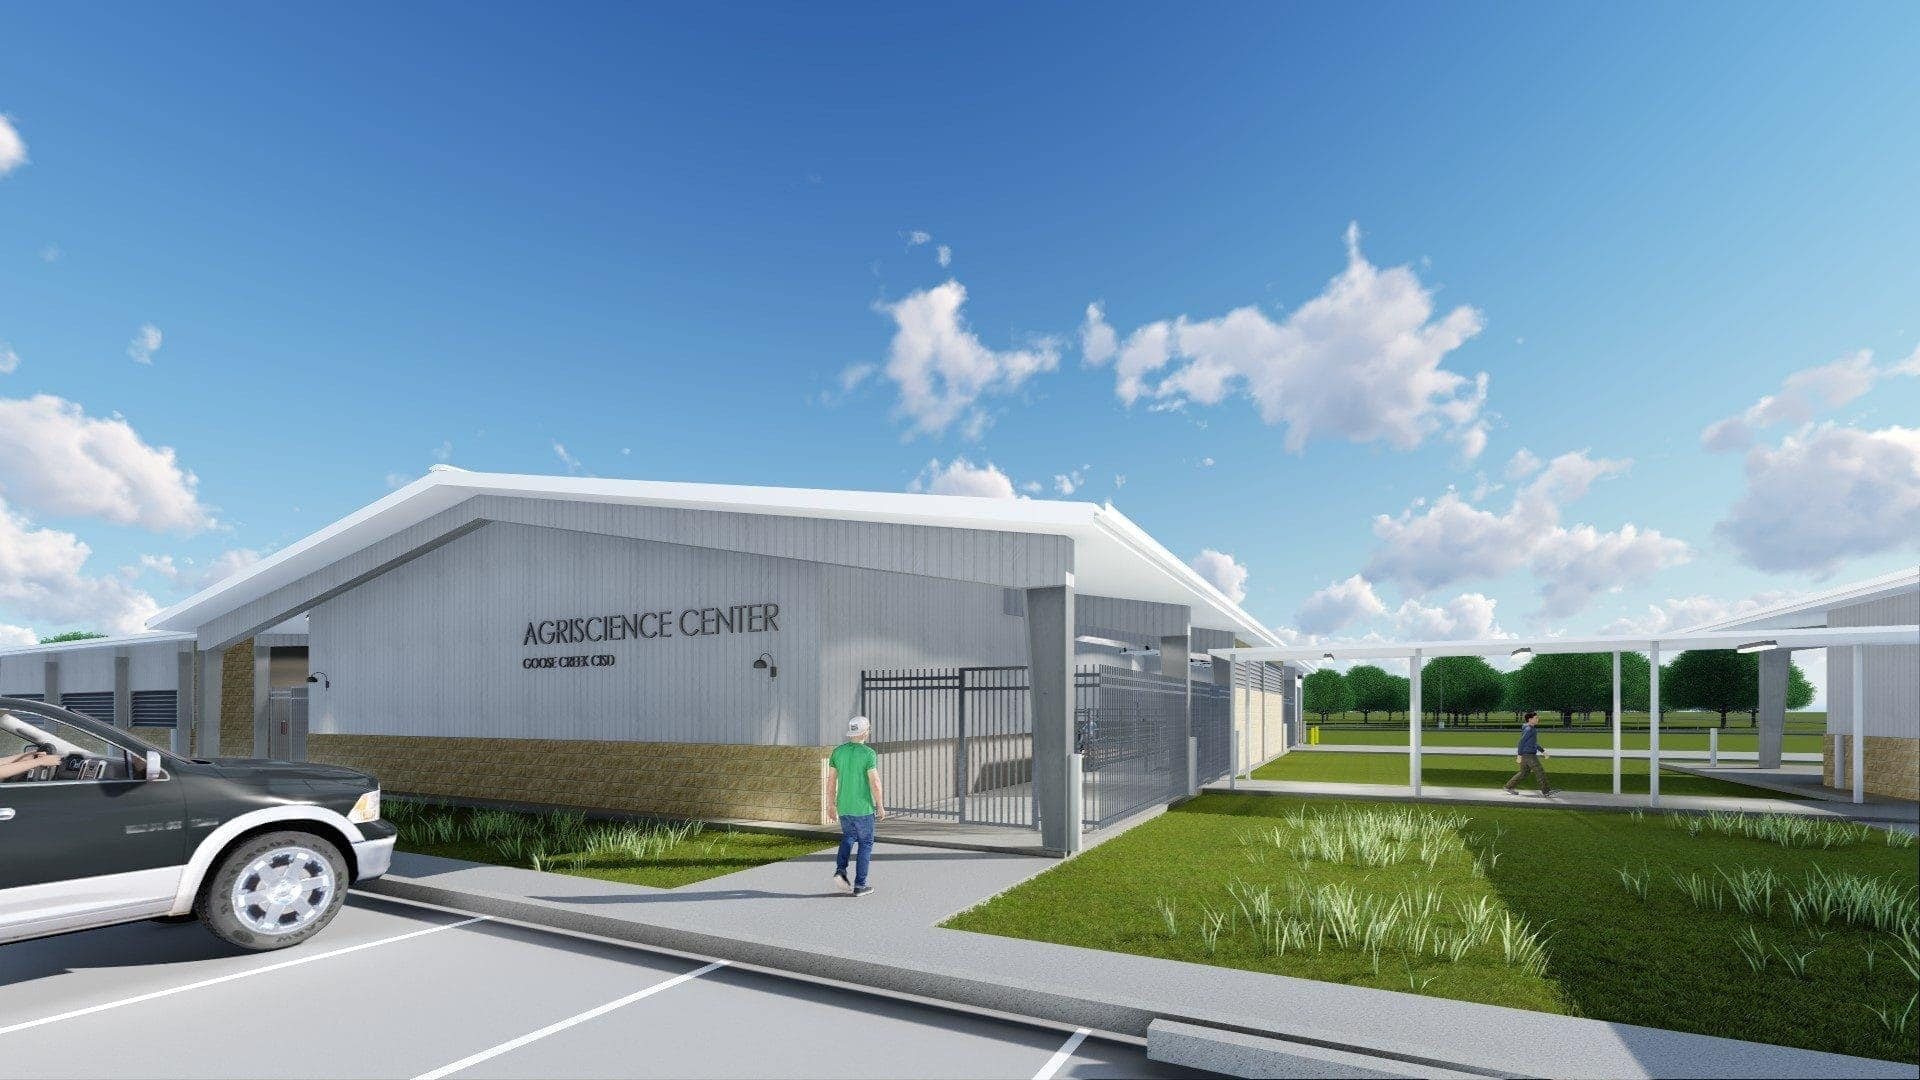 renovación del centro agrícola en texas